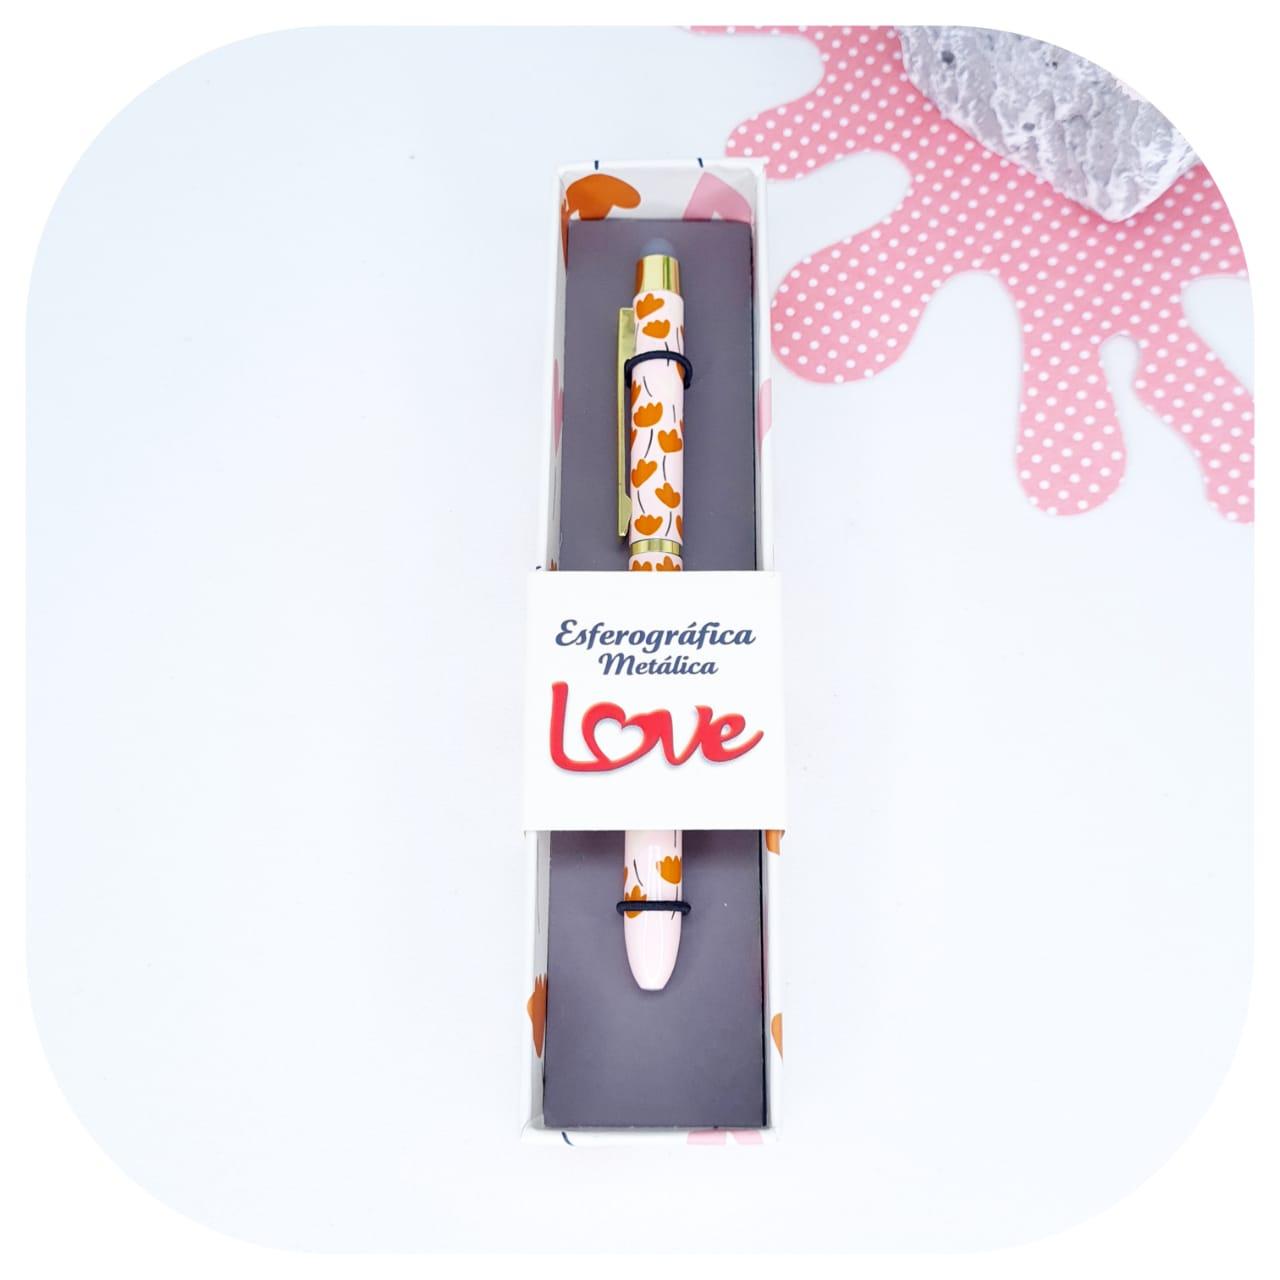 Caneta Esferográfica Metálica com Touch Love - Molin